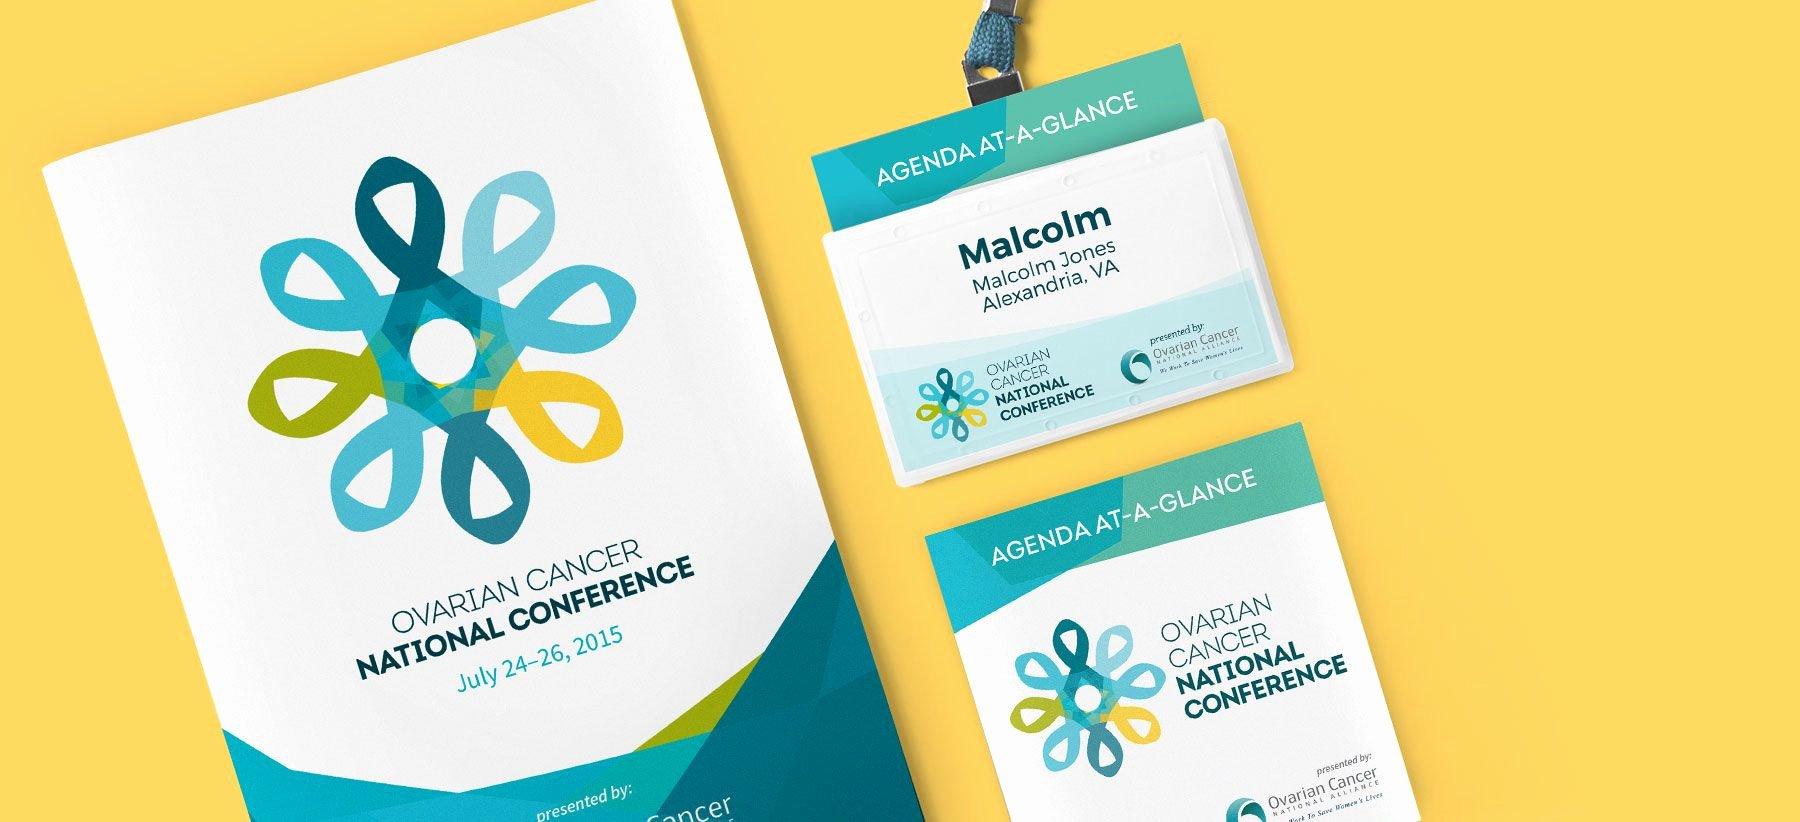 Conference Program Book Template Awesome Conference Program Badge and Pocket Agenda Print Design